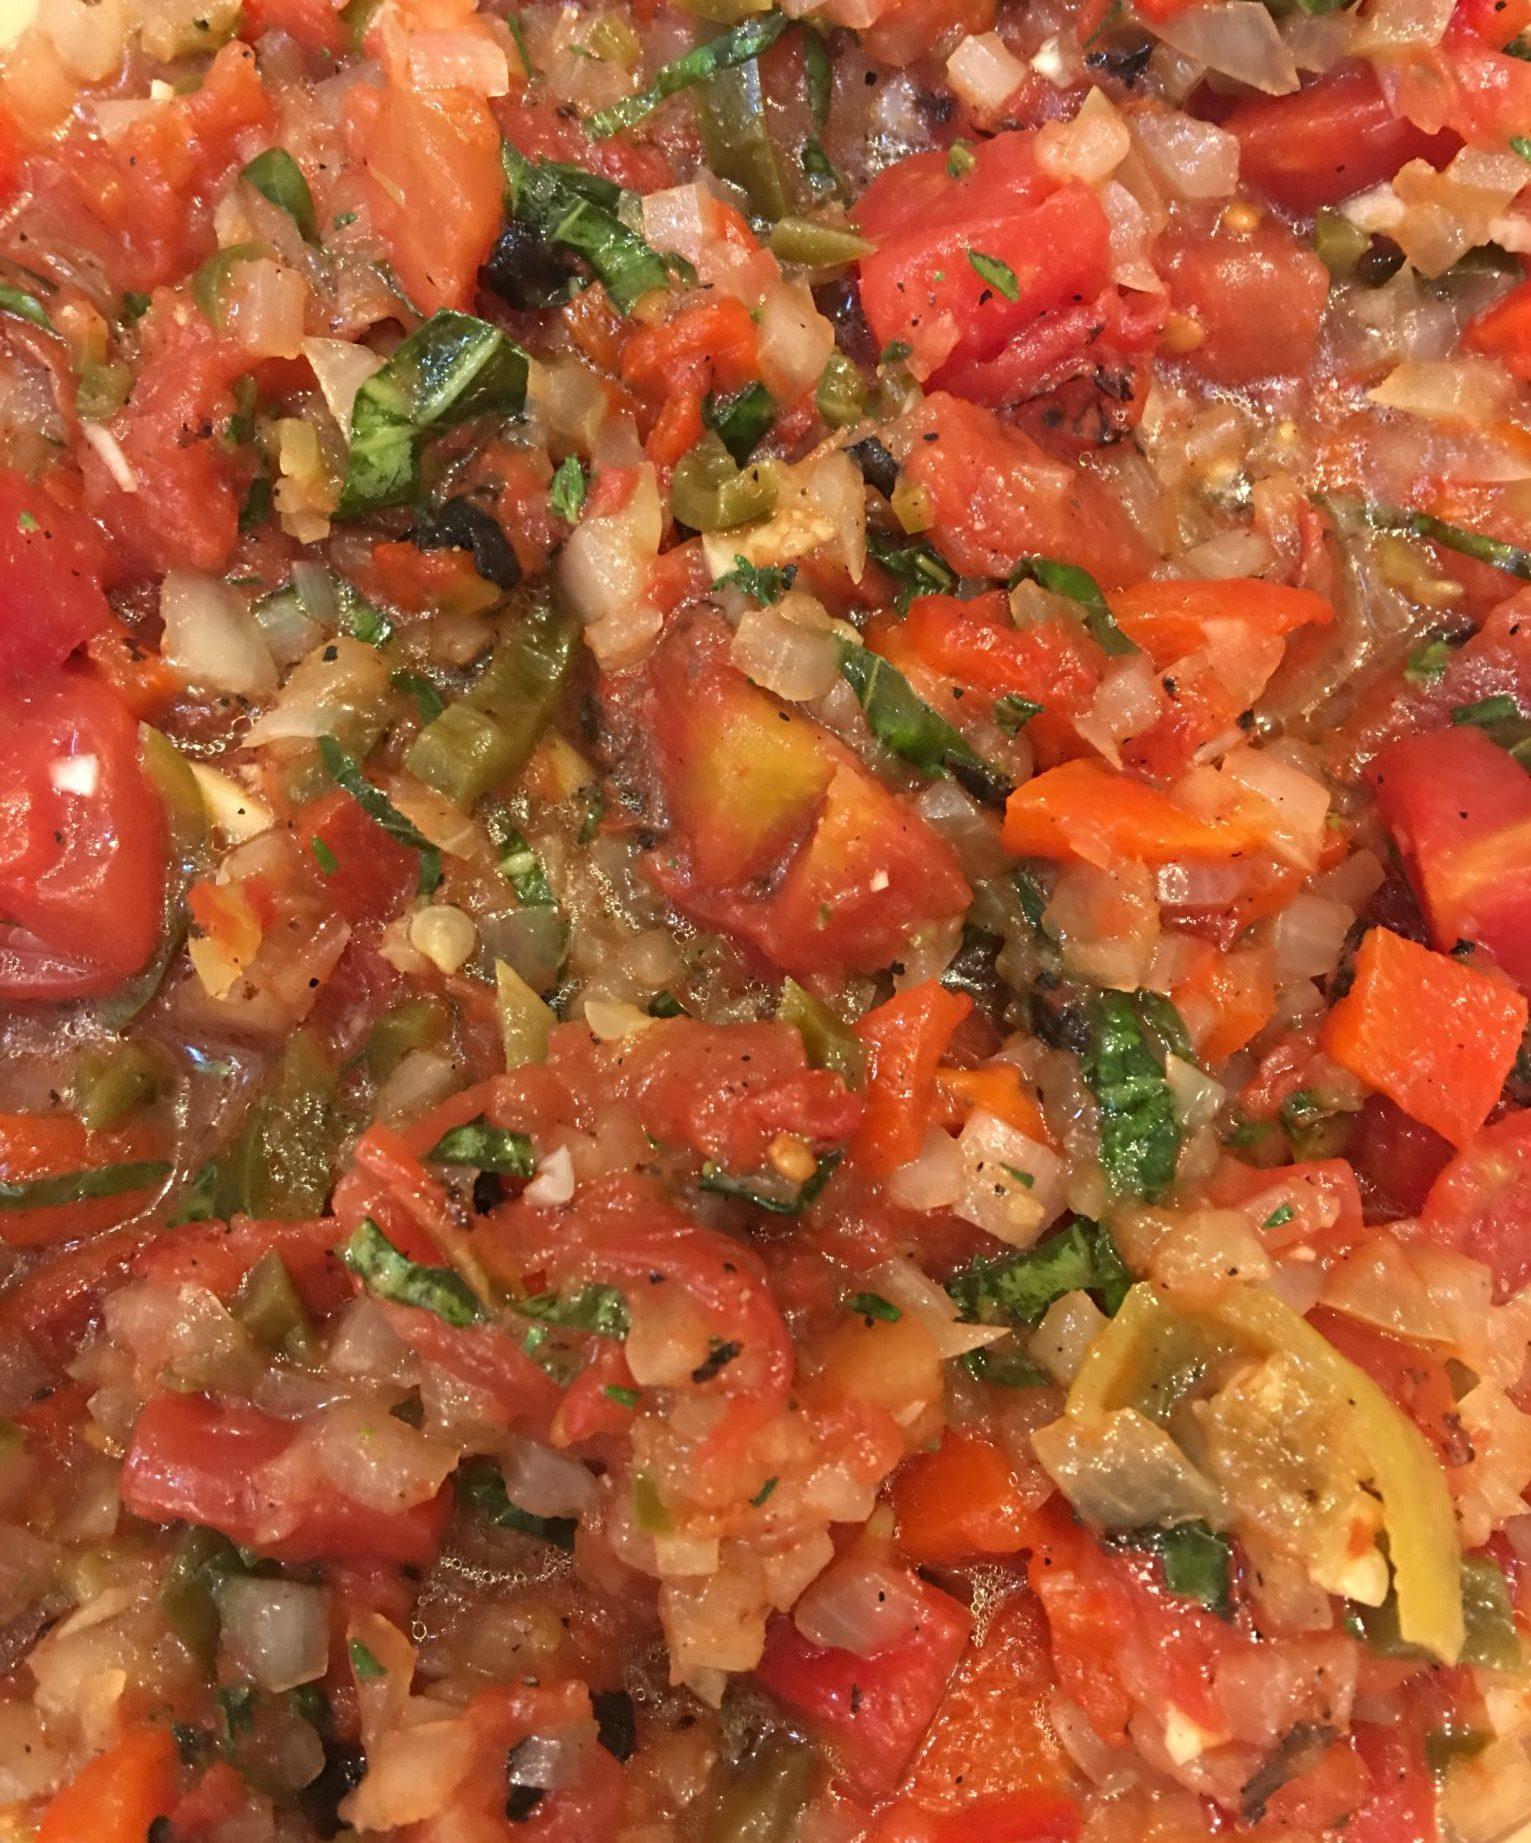 Hubert Kellers Spicy-Tomato Relish